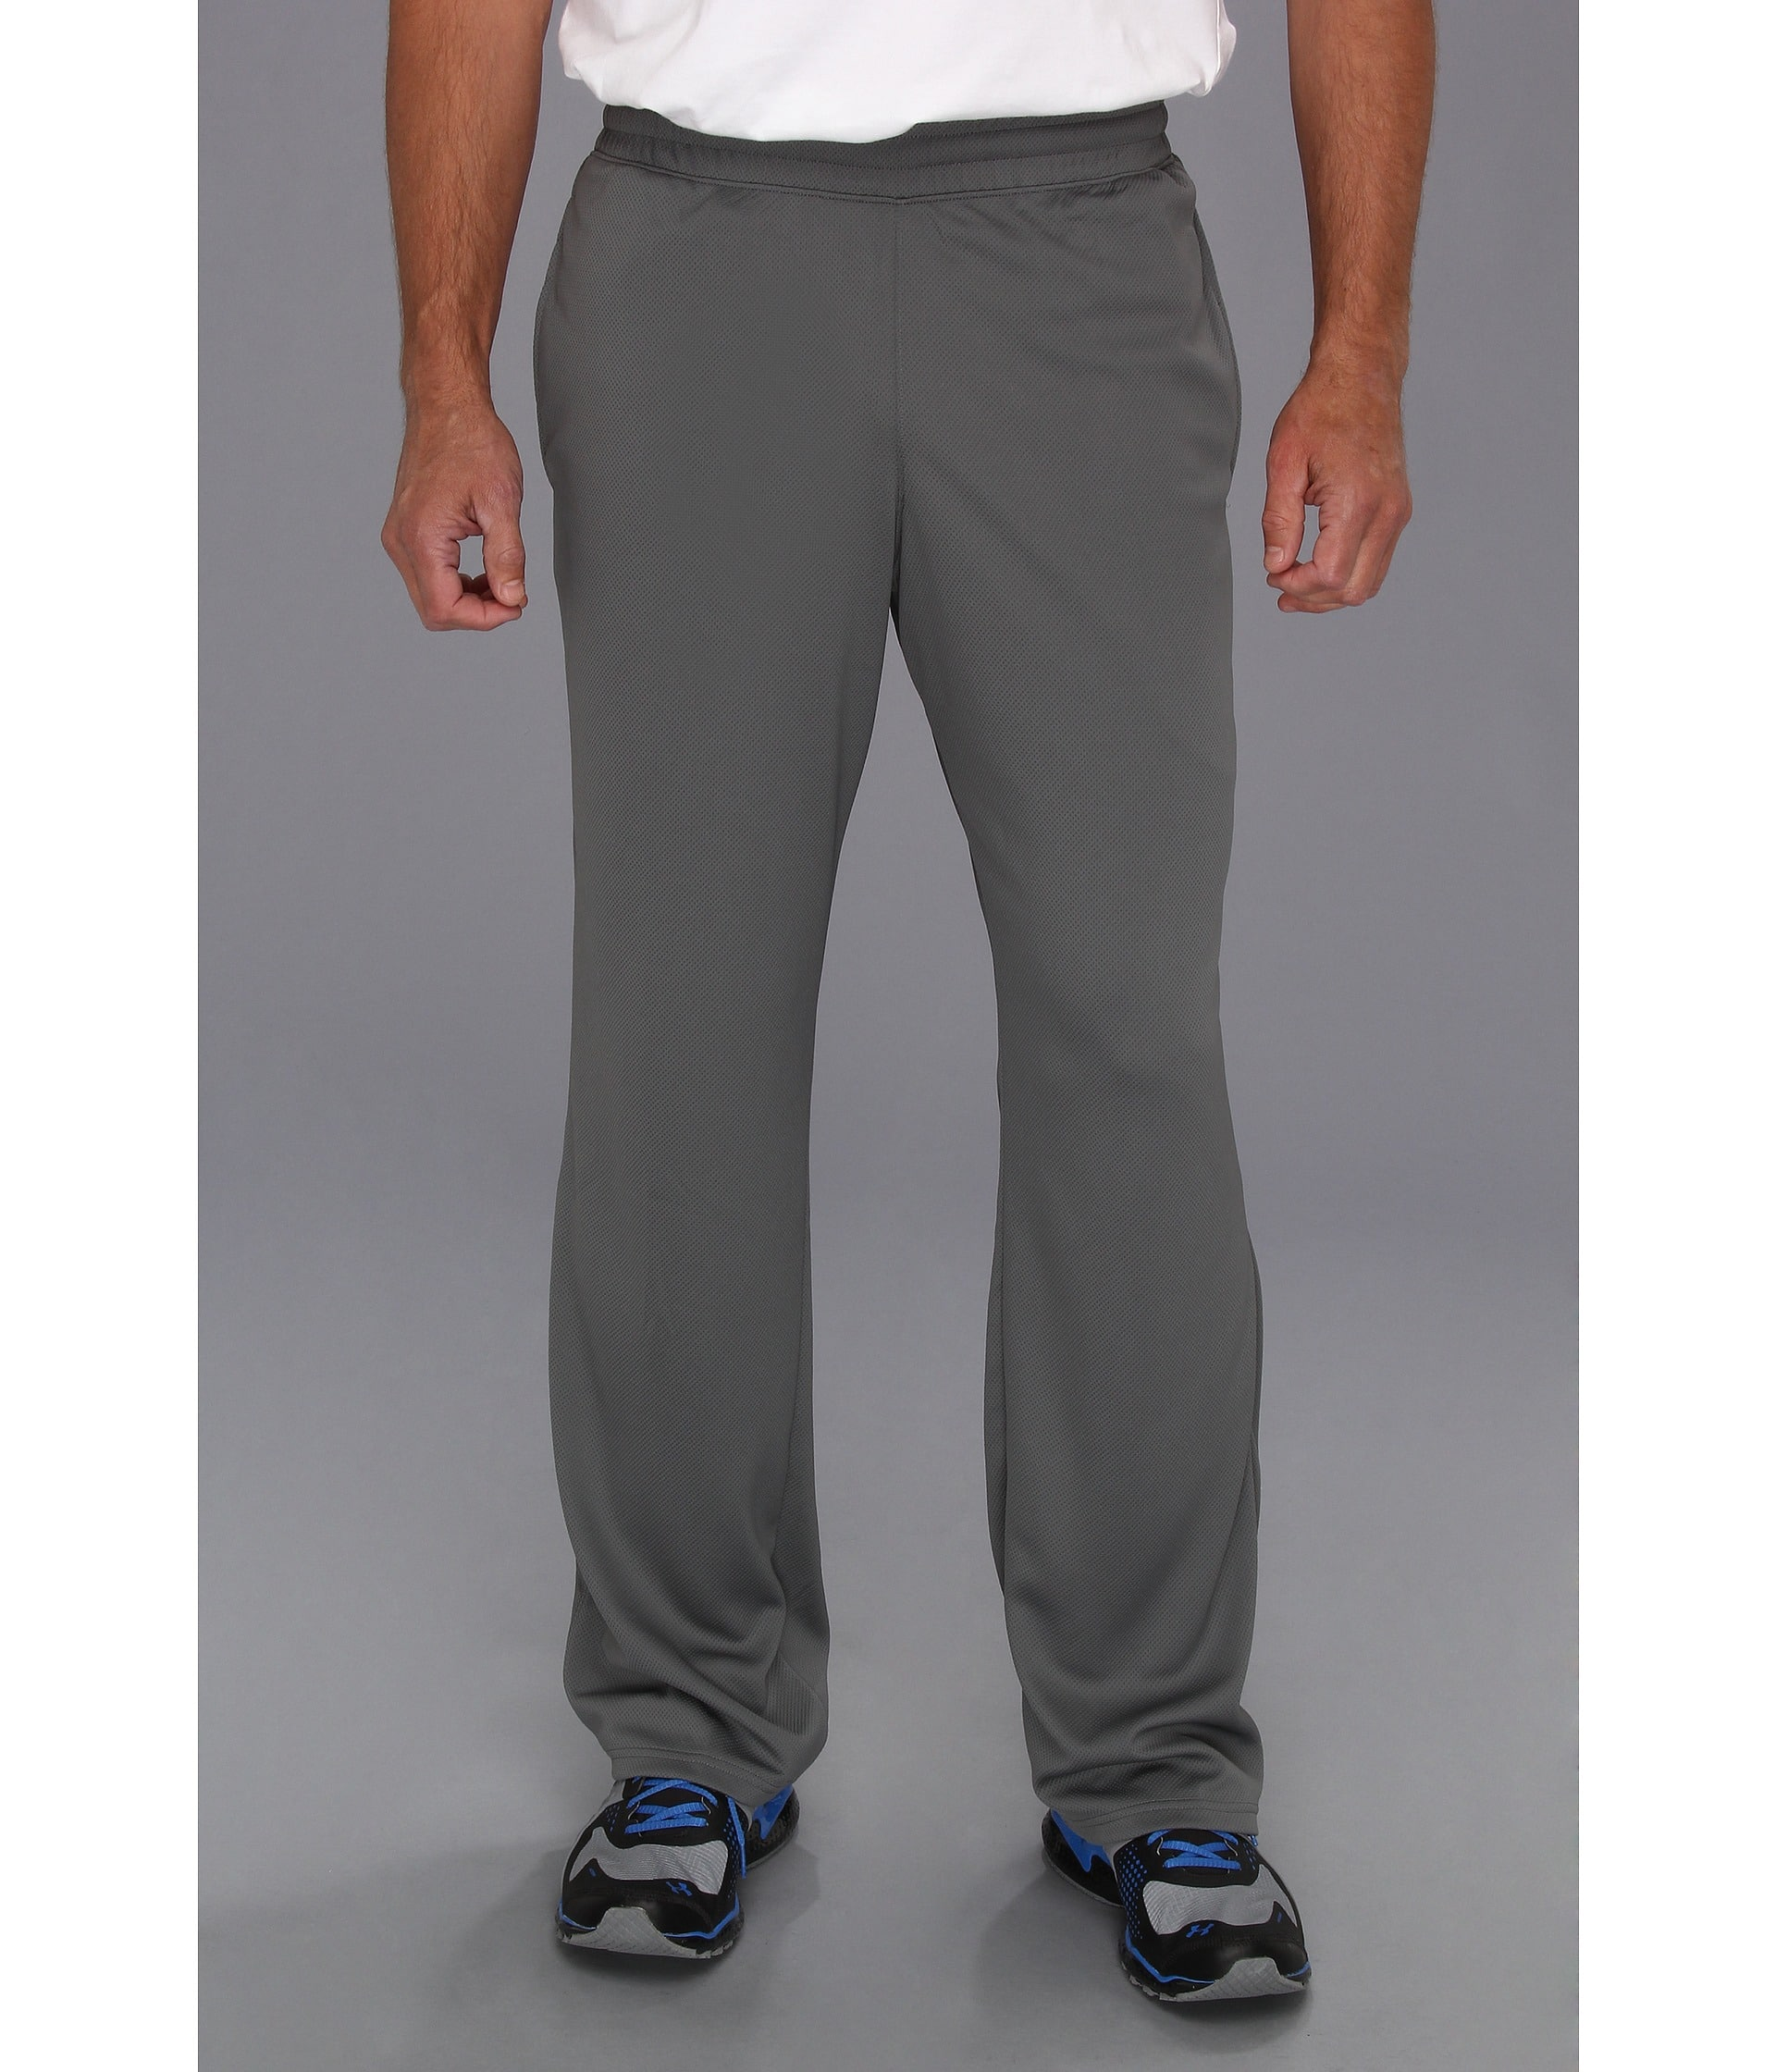 2-Pairs Men's Under Armour UA Reflex Moisture Wicking Pants  $29 + Free Shipping